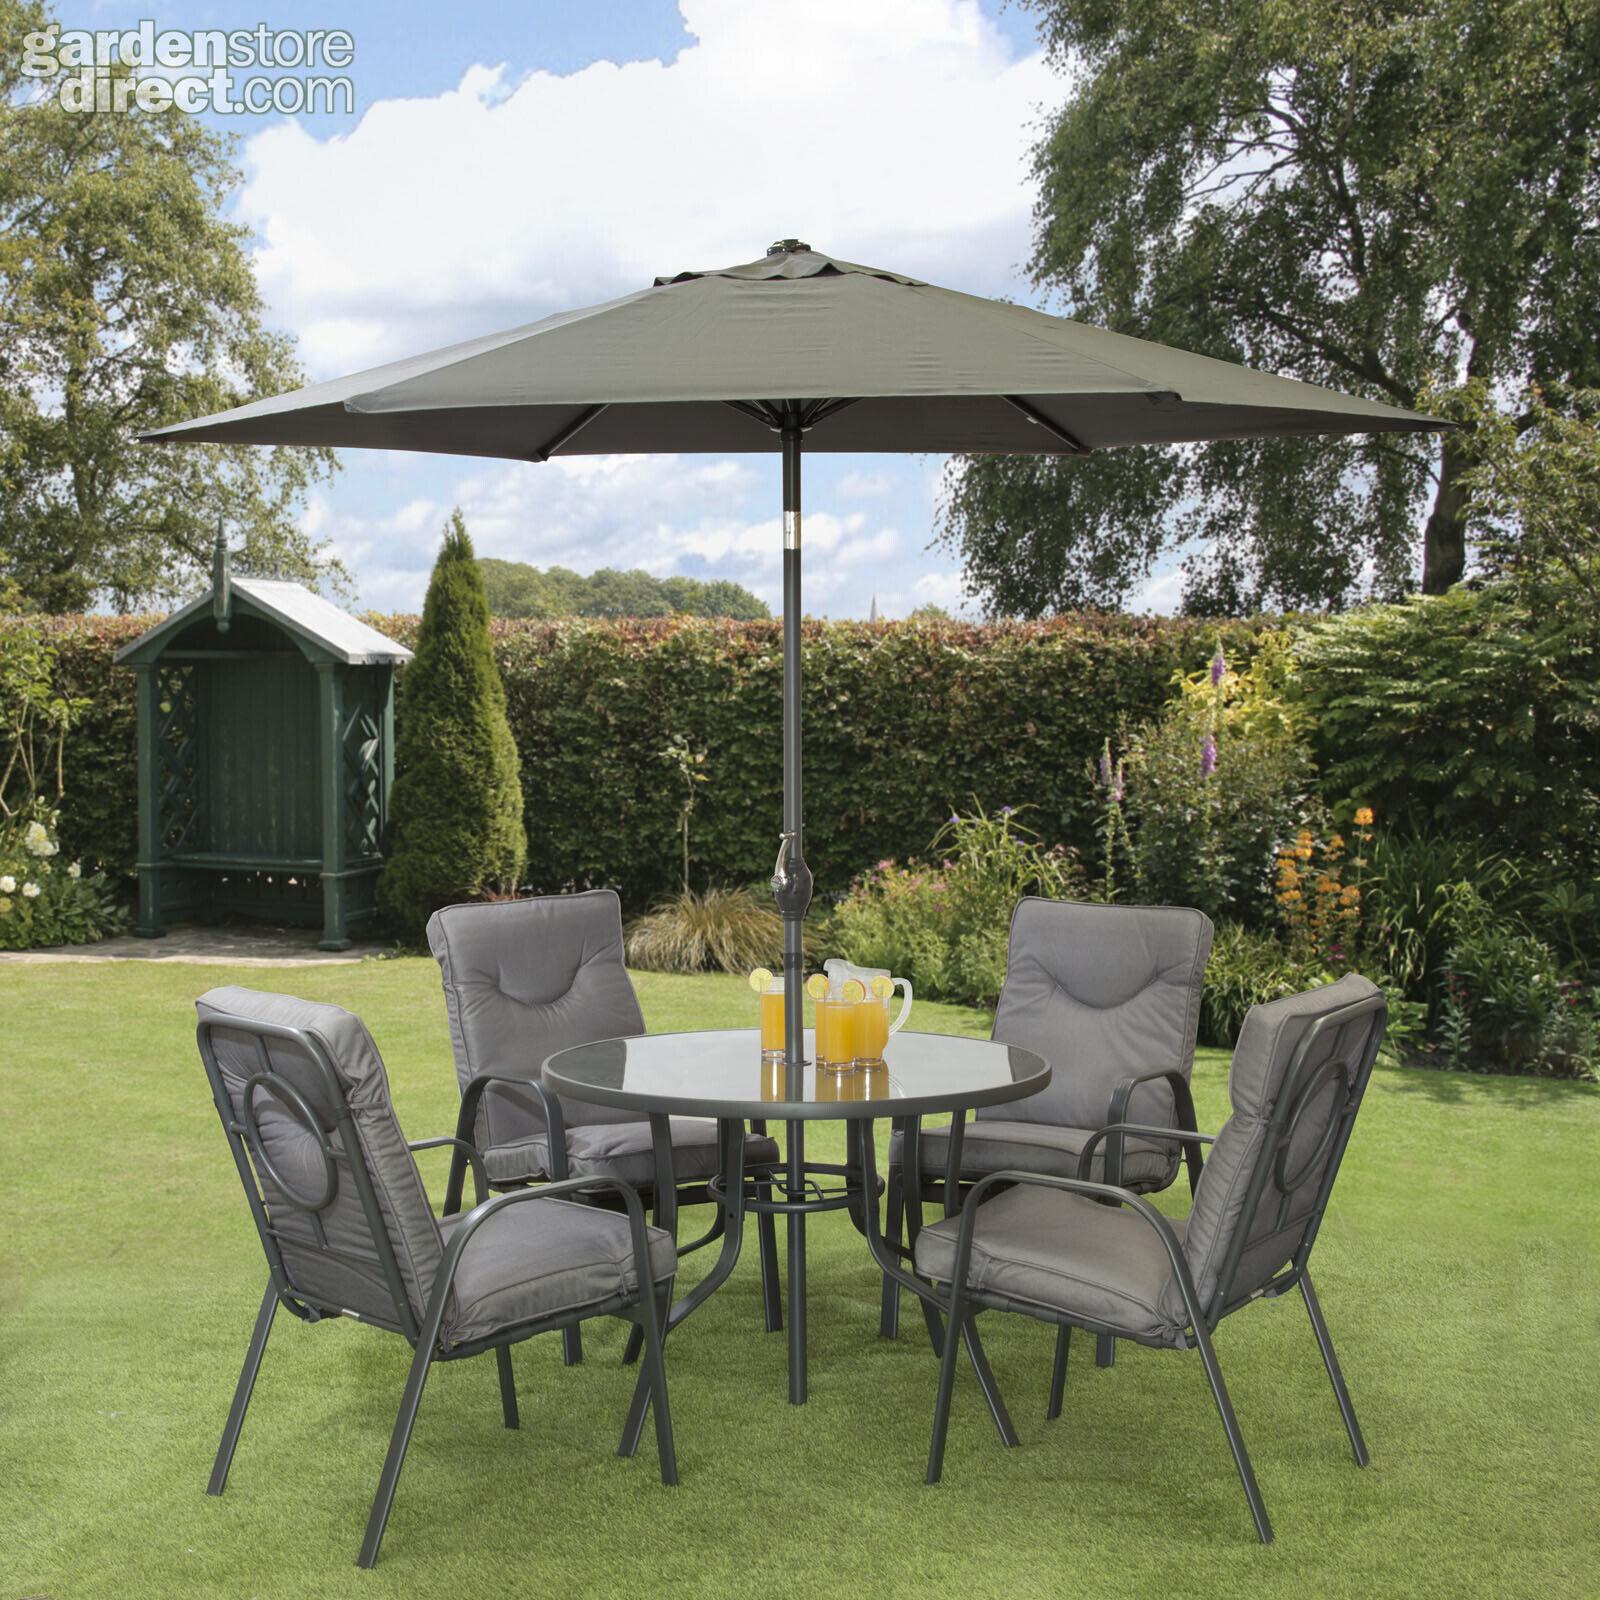 Garden Furniture - Candosa Padded Garden Furniture, Dining, Lounge & Sunloungers - High Quality!!!!